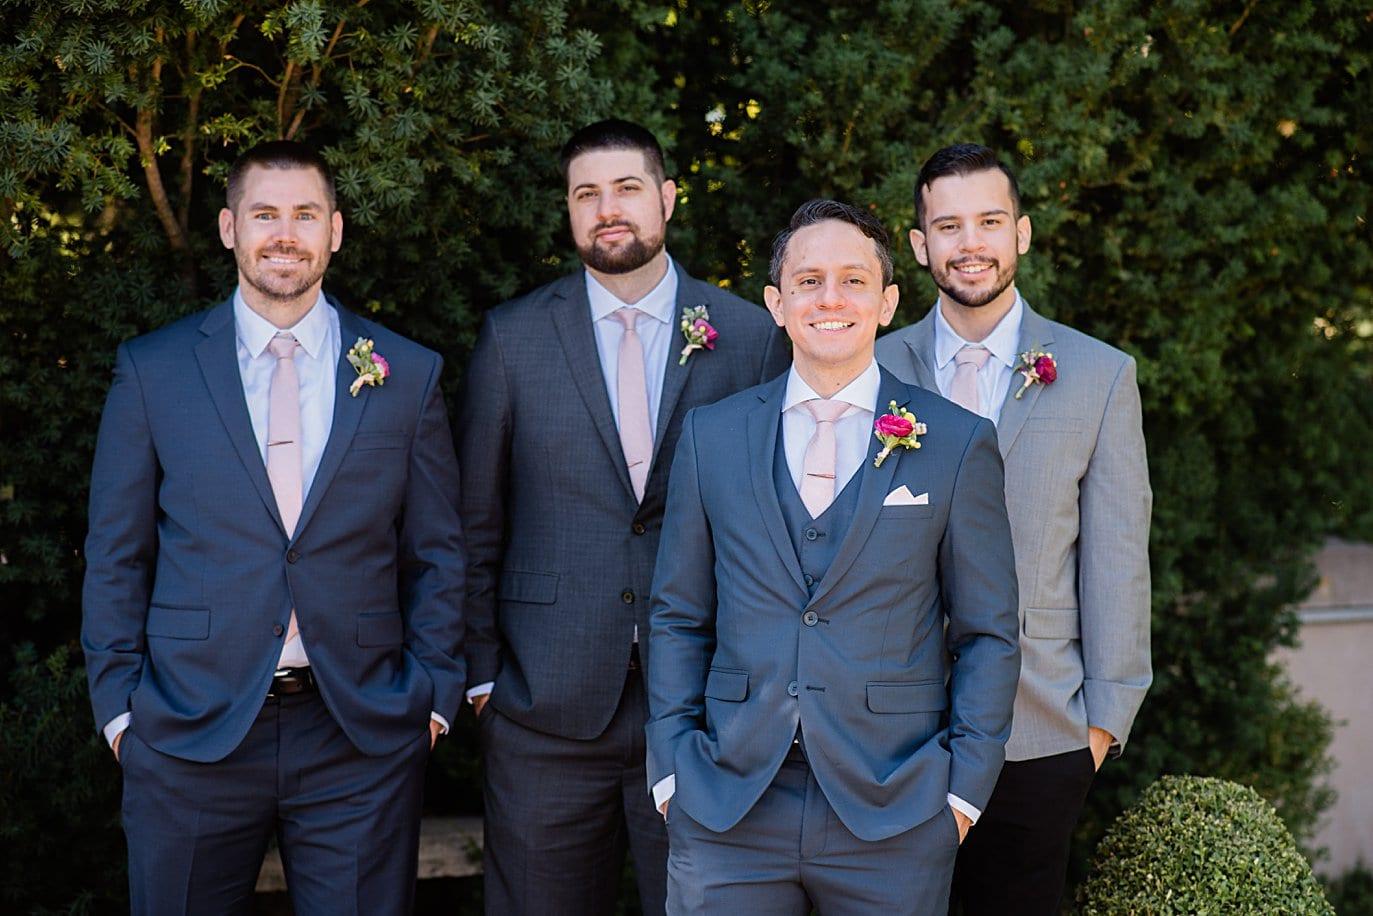 groom in blue suit with groomsmen in mismatched suites at Denver Botanic Gardens wedding by Denver wedding photographer Jennie Crate